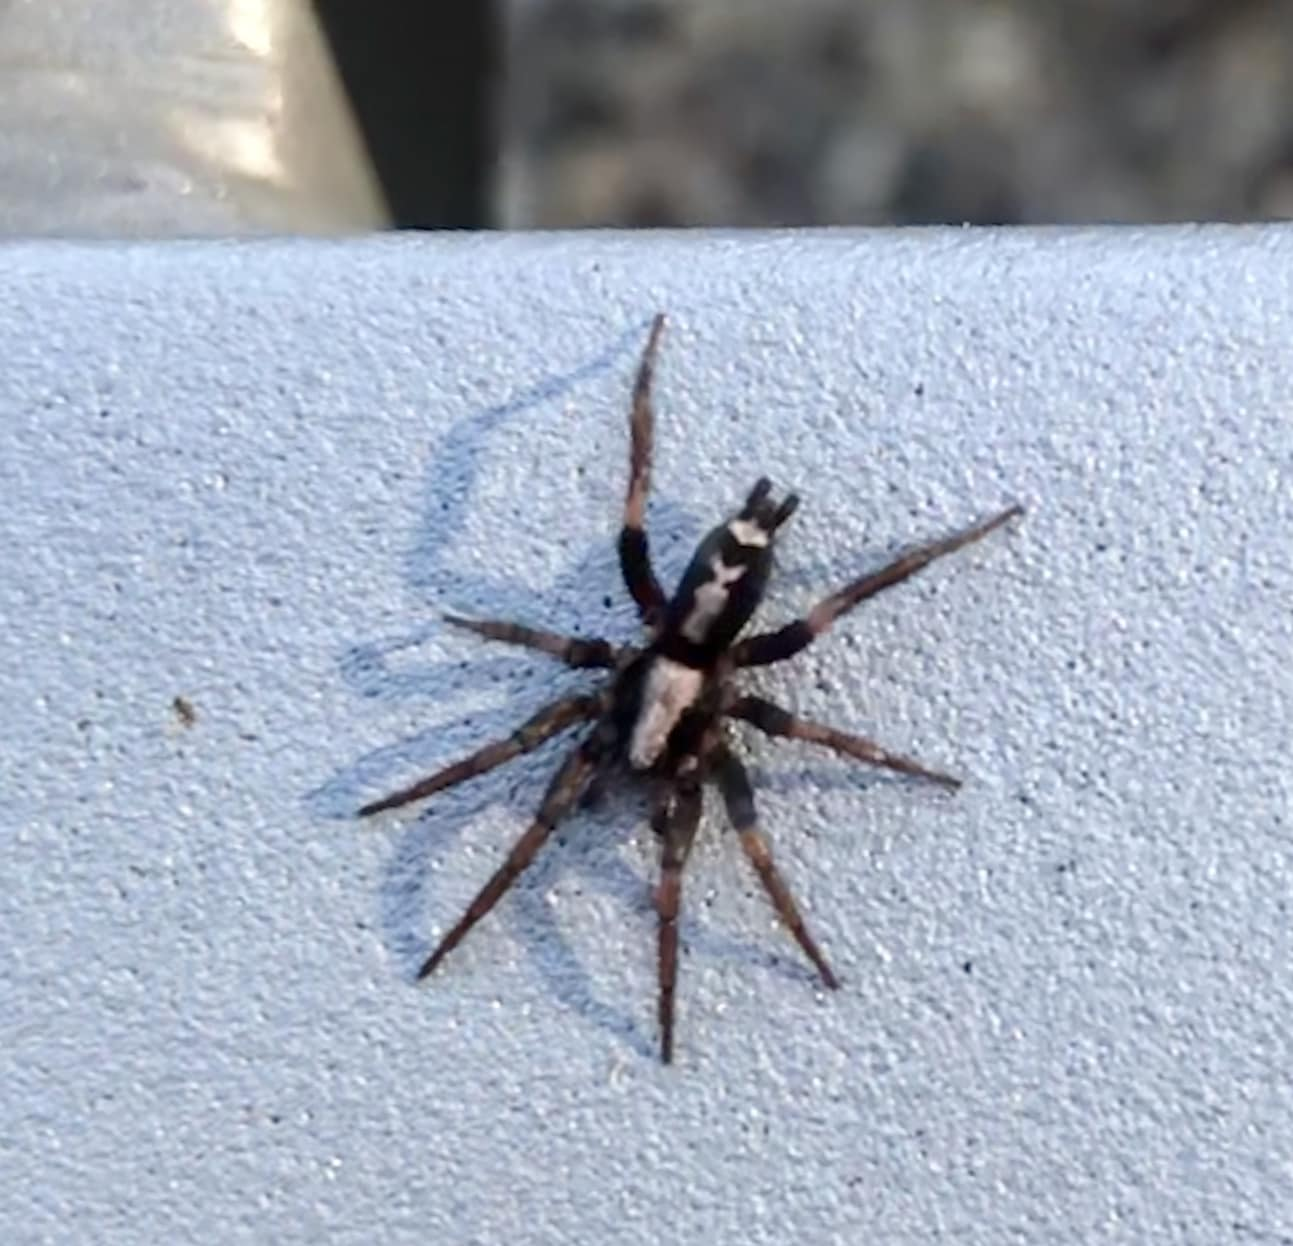 Herpyllus Ecclesiasticus Eastern Parson Spider In Austin Texas